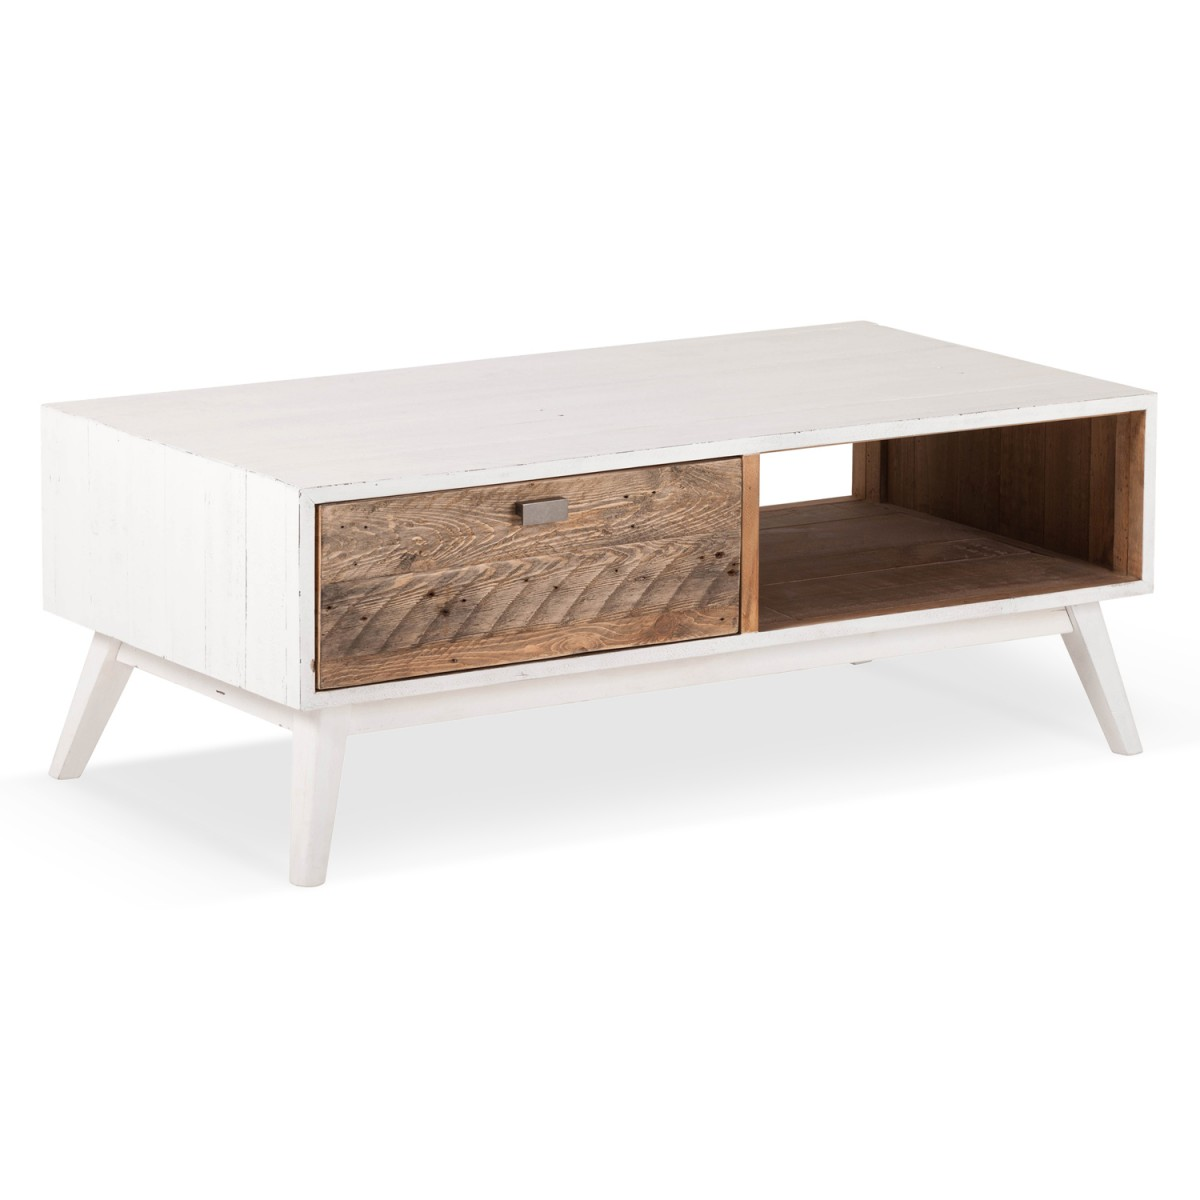 Table basse 1 Tiroir Bois Blanc 120x60x45cm